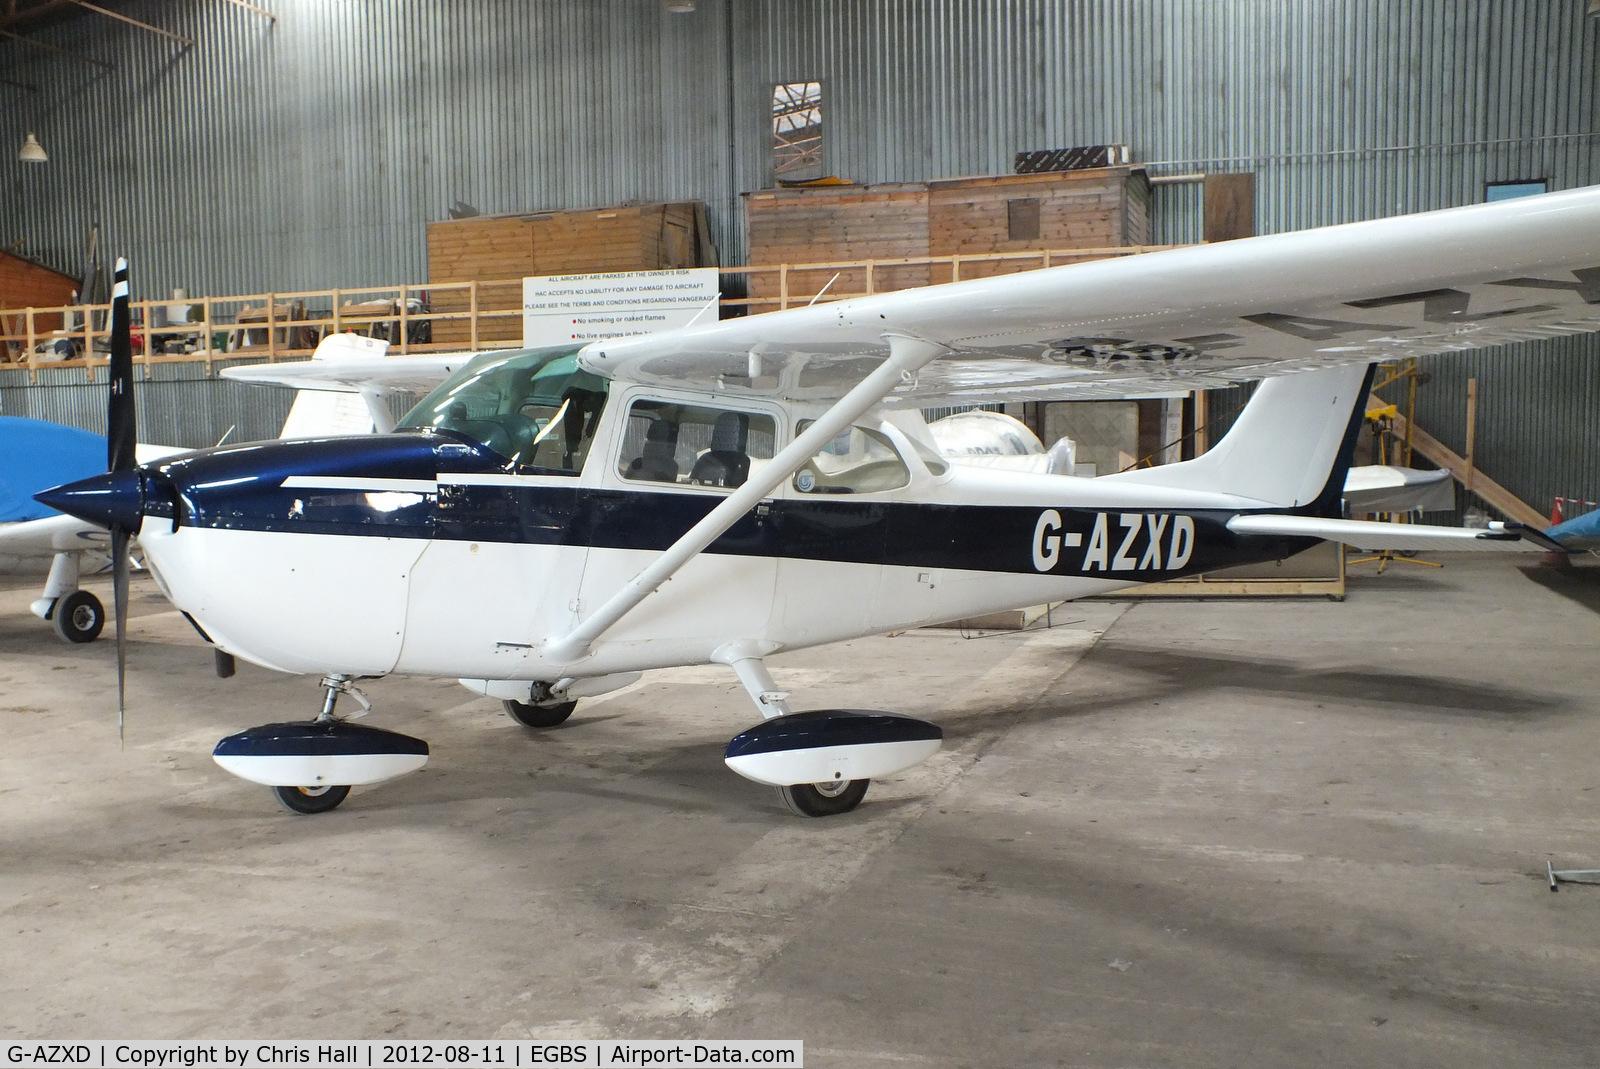 G-AZXD, 1972 Reims F172L Skyhawk C/N 0878, at Shobdon Airfield, Herefordshire